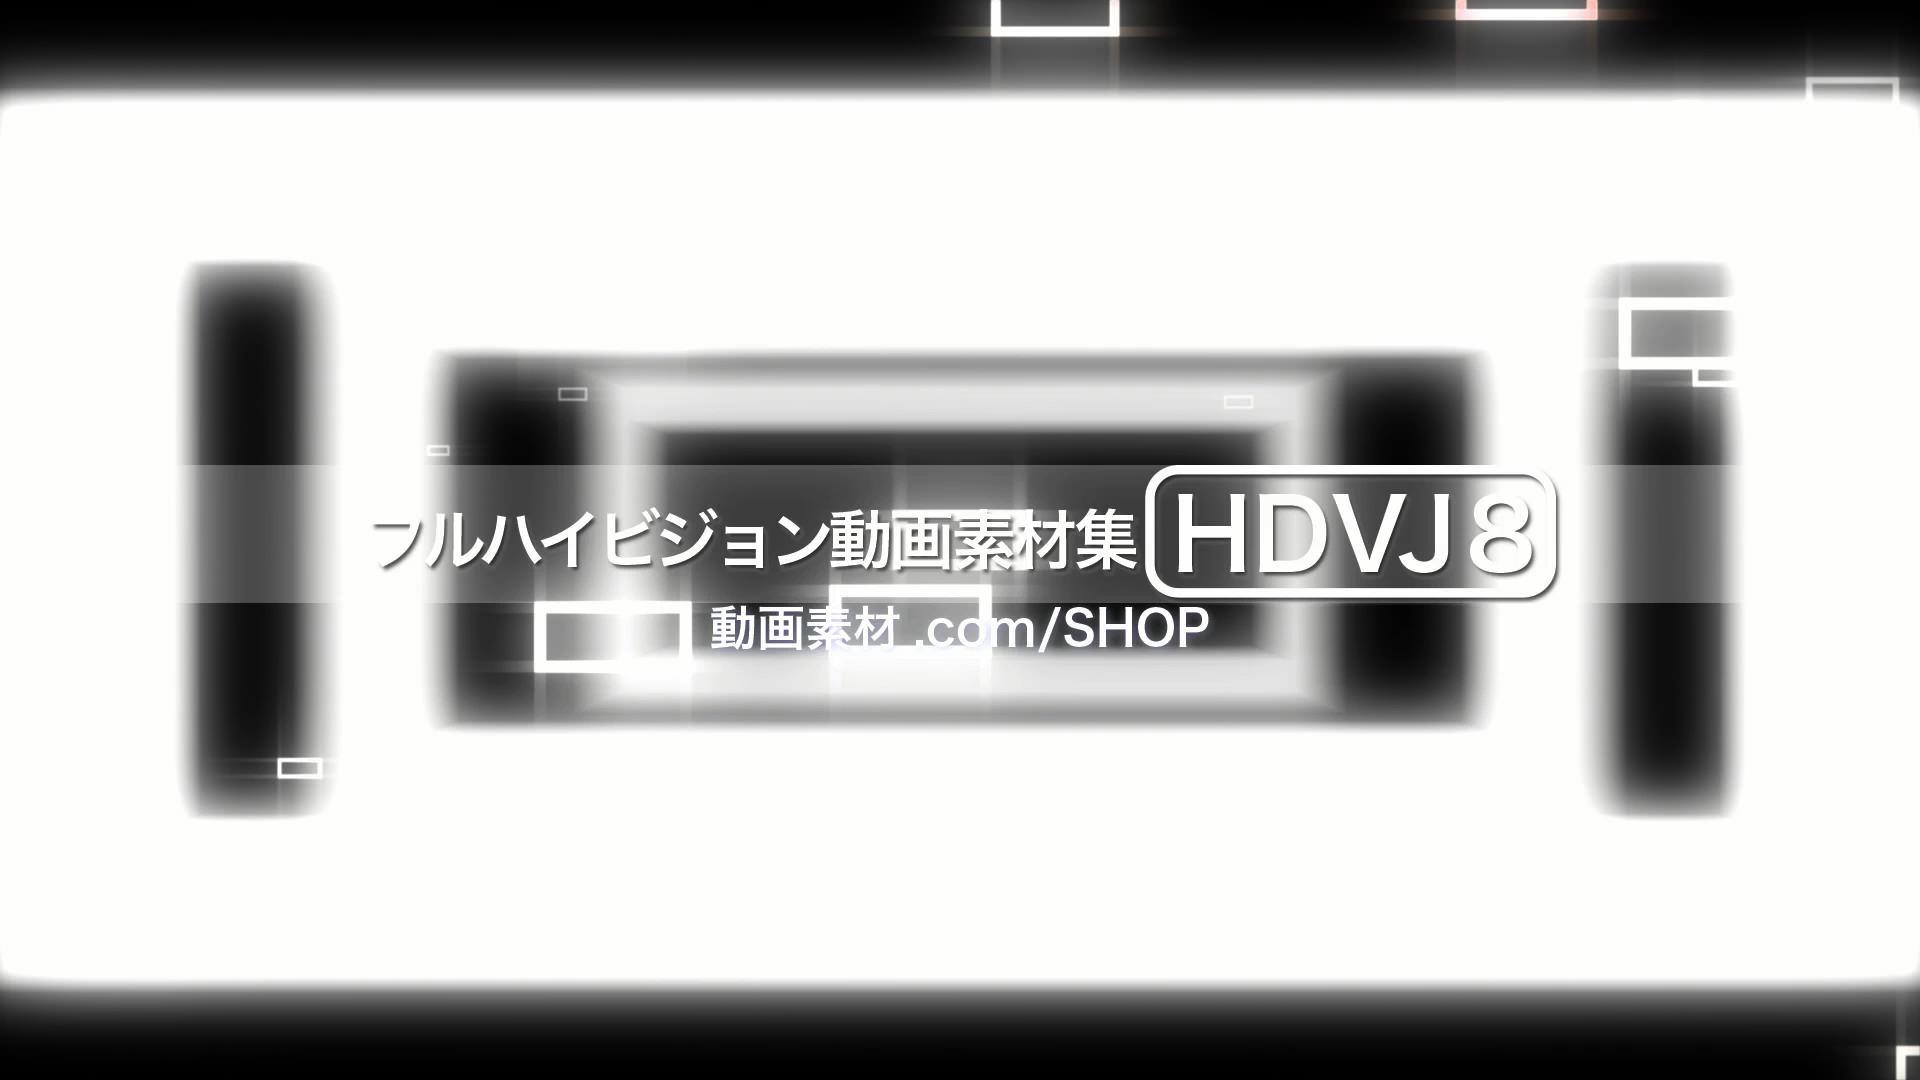 MovieMaterial HDVJ8 フルハイビジョンVJ動画素材集 画像3